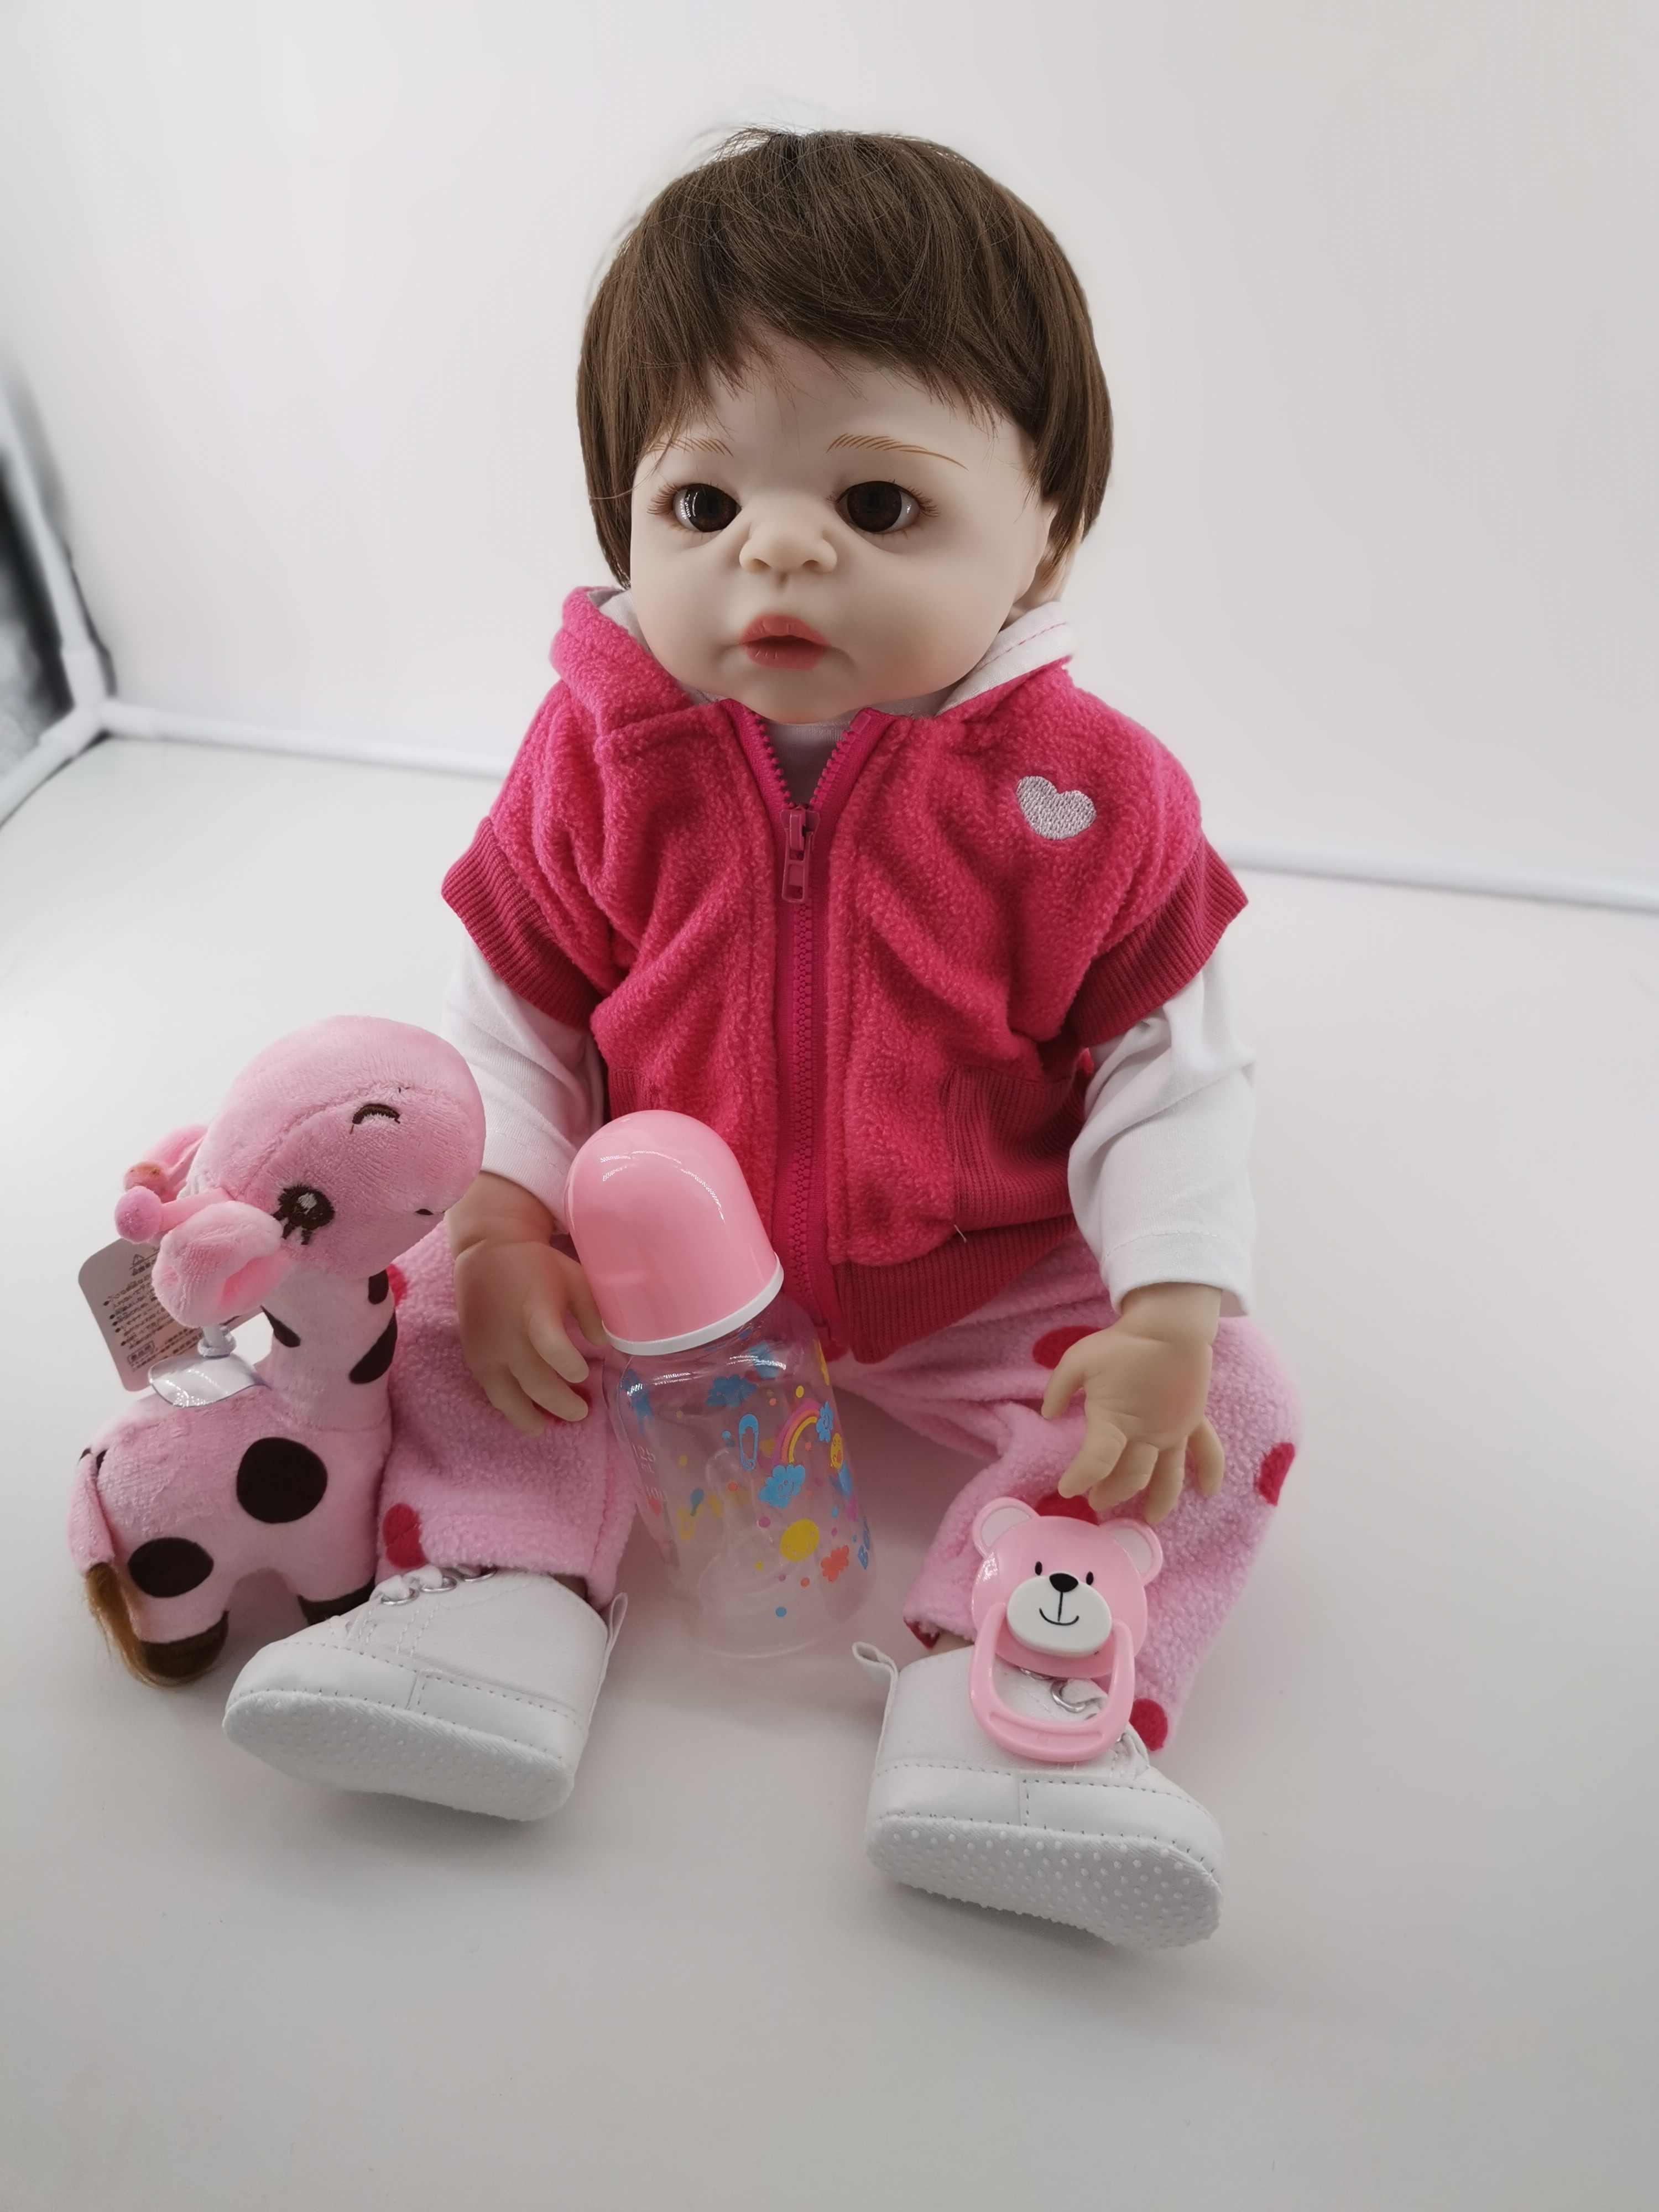 47 CENTÍMETROS bebe renascer renascer baby girl boneca los pelé tan lol brinquedo de Banho de corpo inteiro de silicone bonecas de natal Gfit